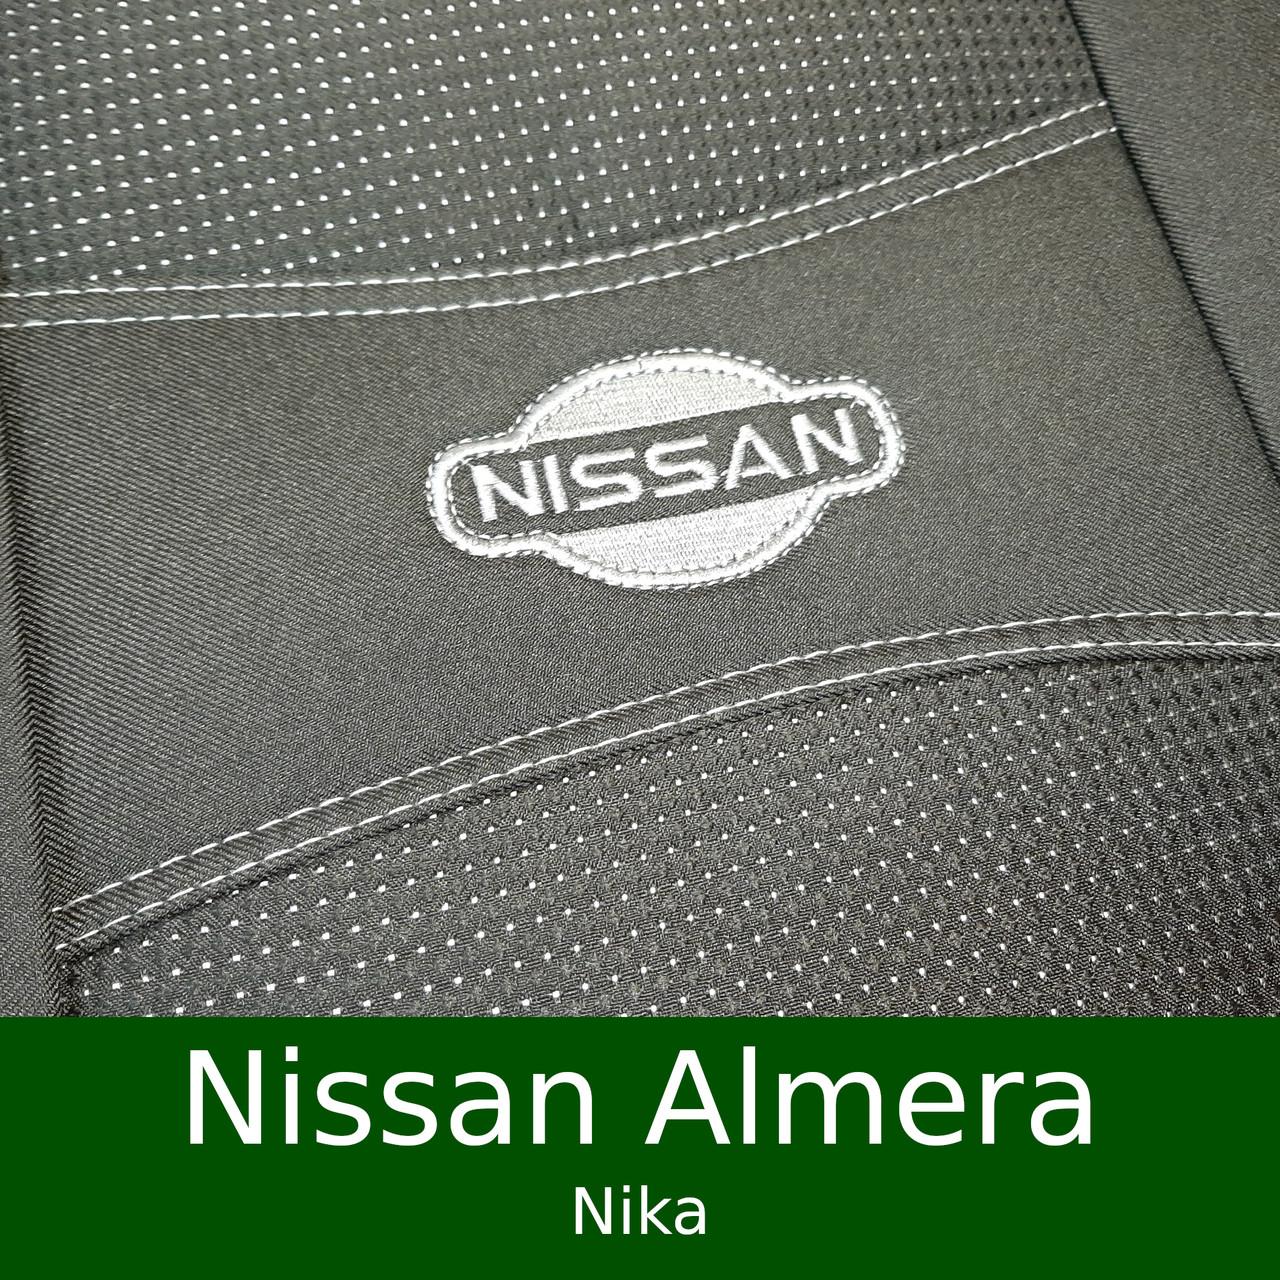 "Чехлы на Ниссан Алмера 2006-2012 (классик) / авто чехлы Nissasn Almera classic ""Nika"""